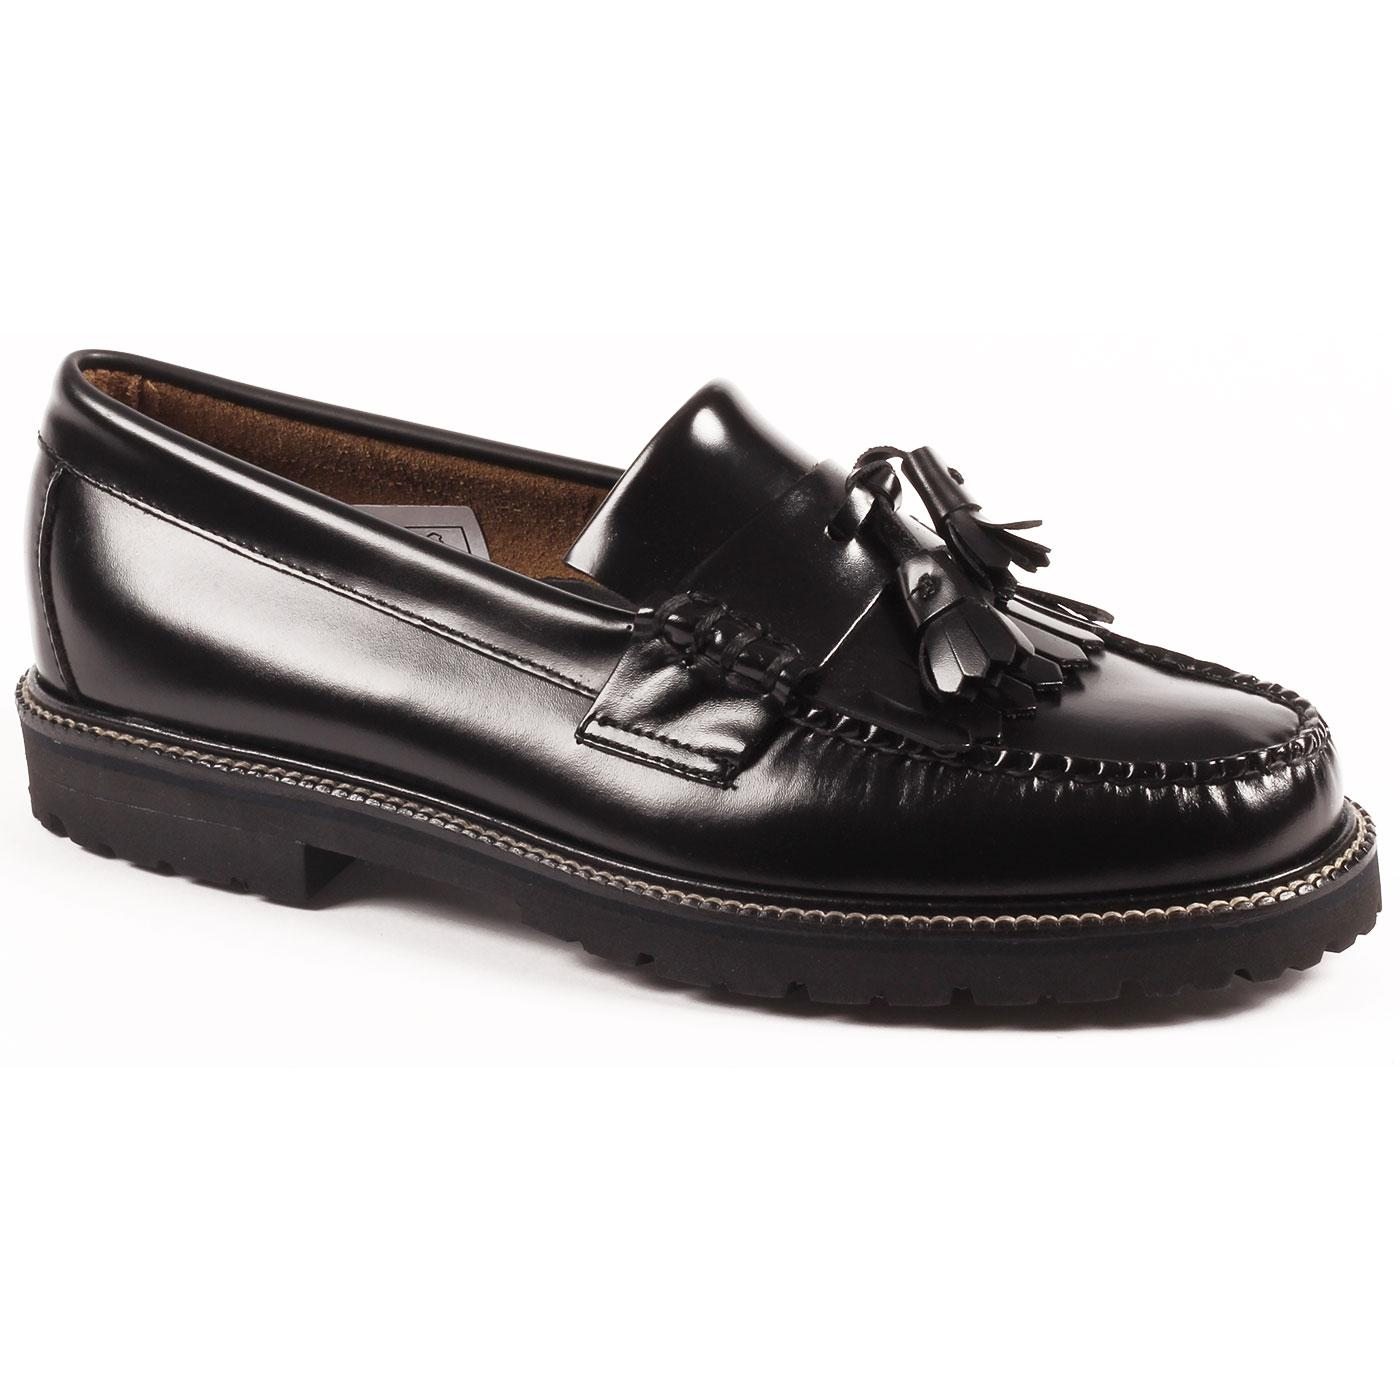 Layton Weejun 90 BASS WEEJUNS Mod Kiltie Loafers B